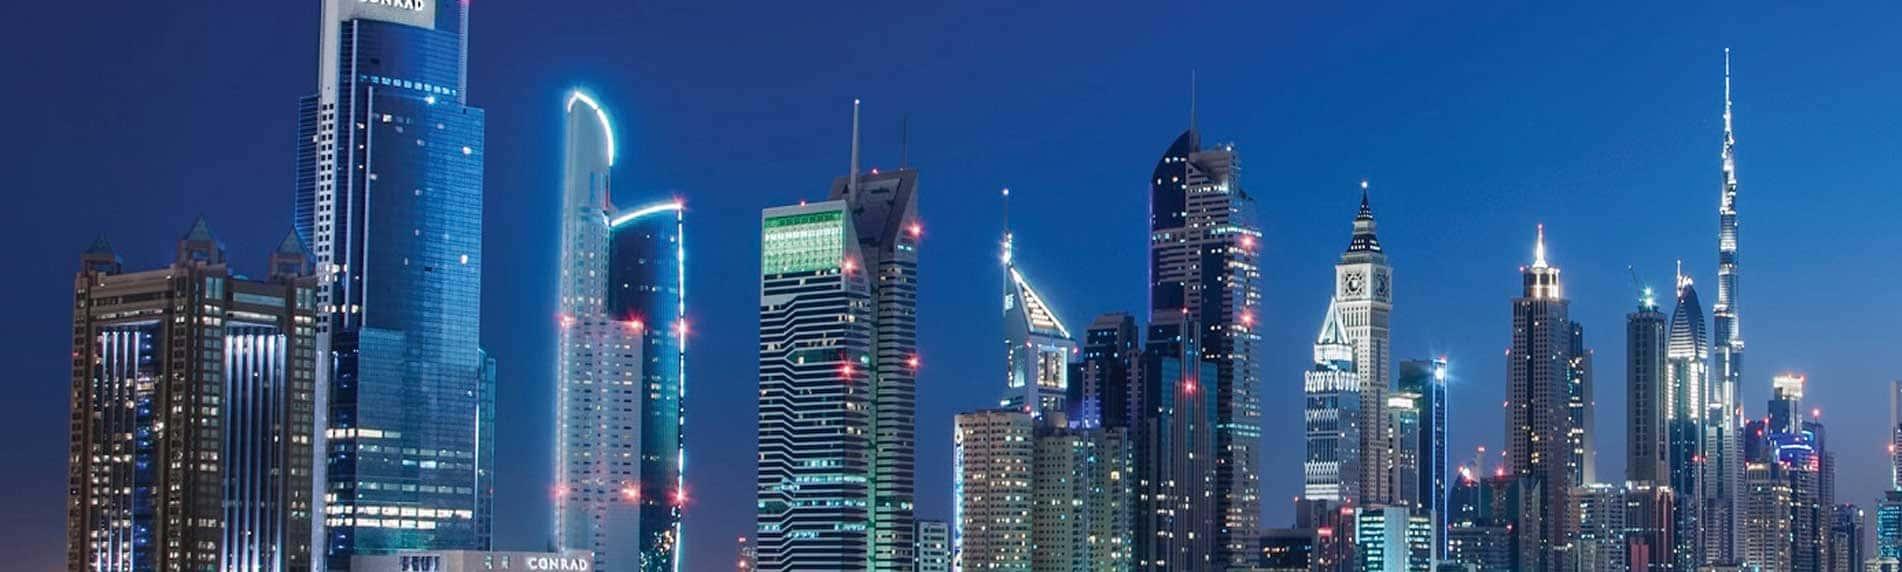 Dubai Landscapes 5 Nights